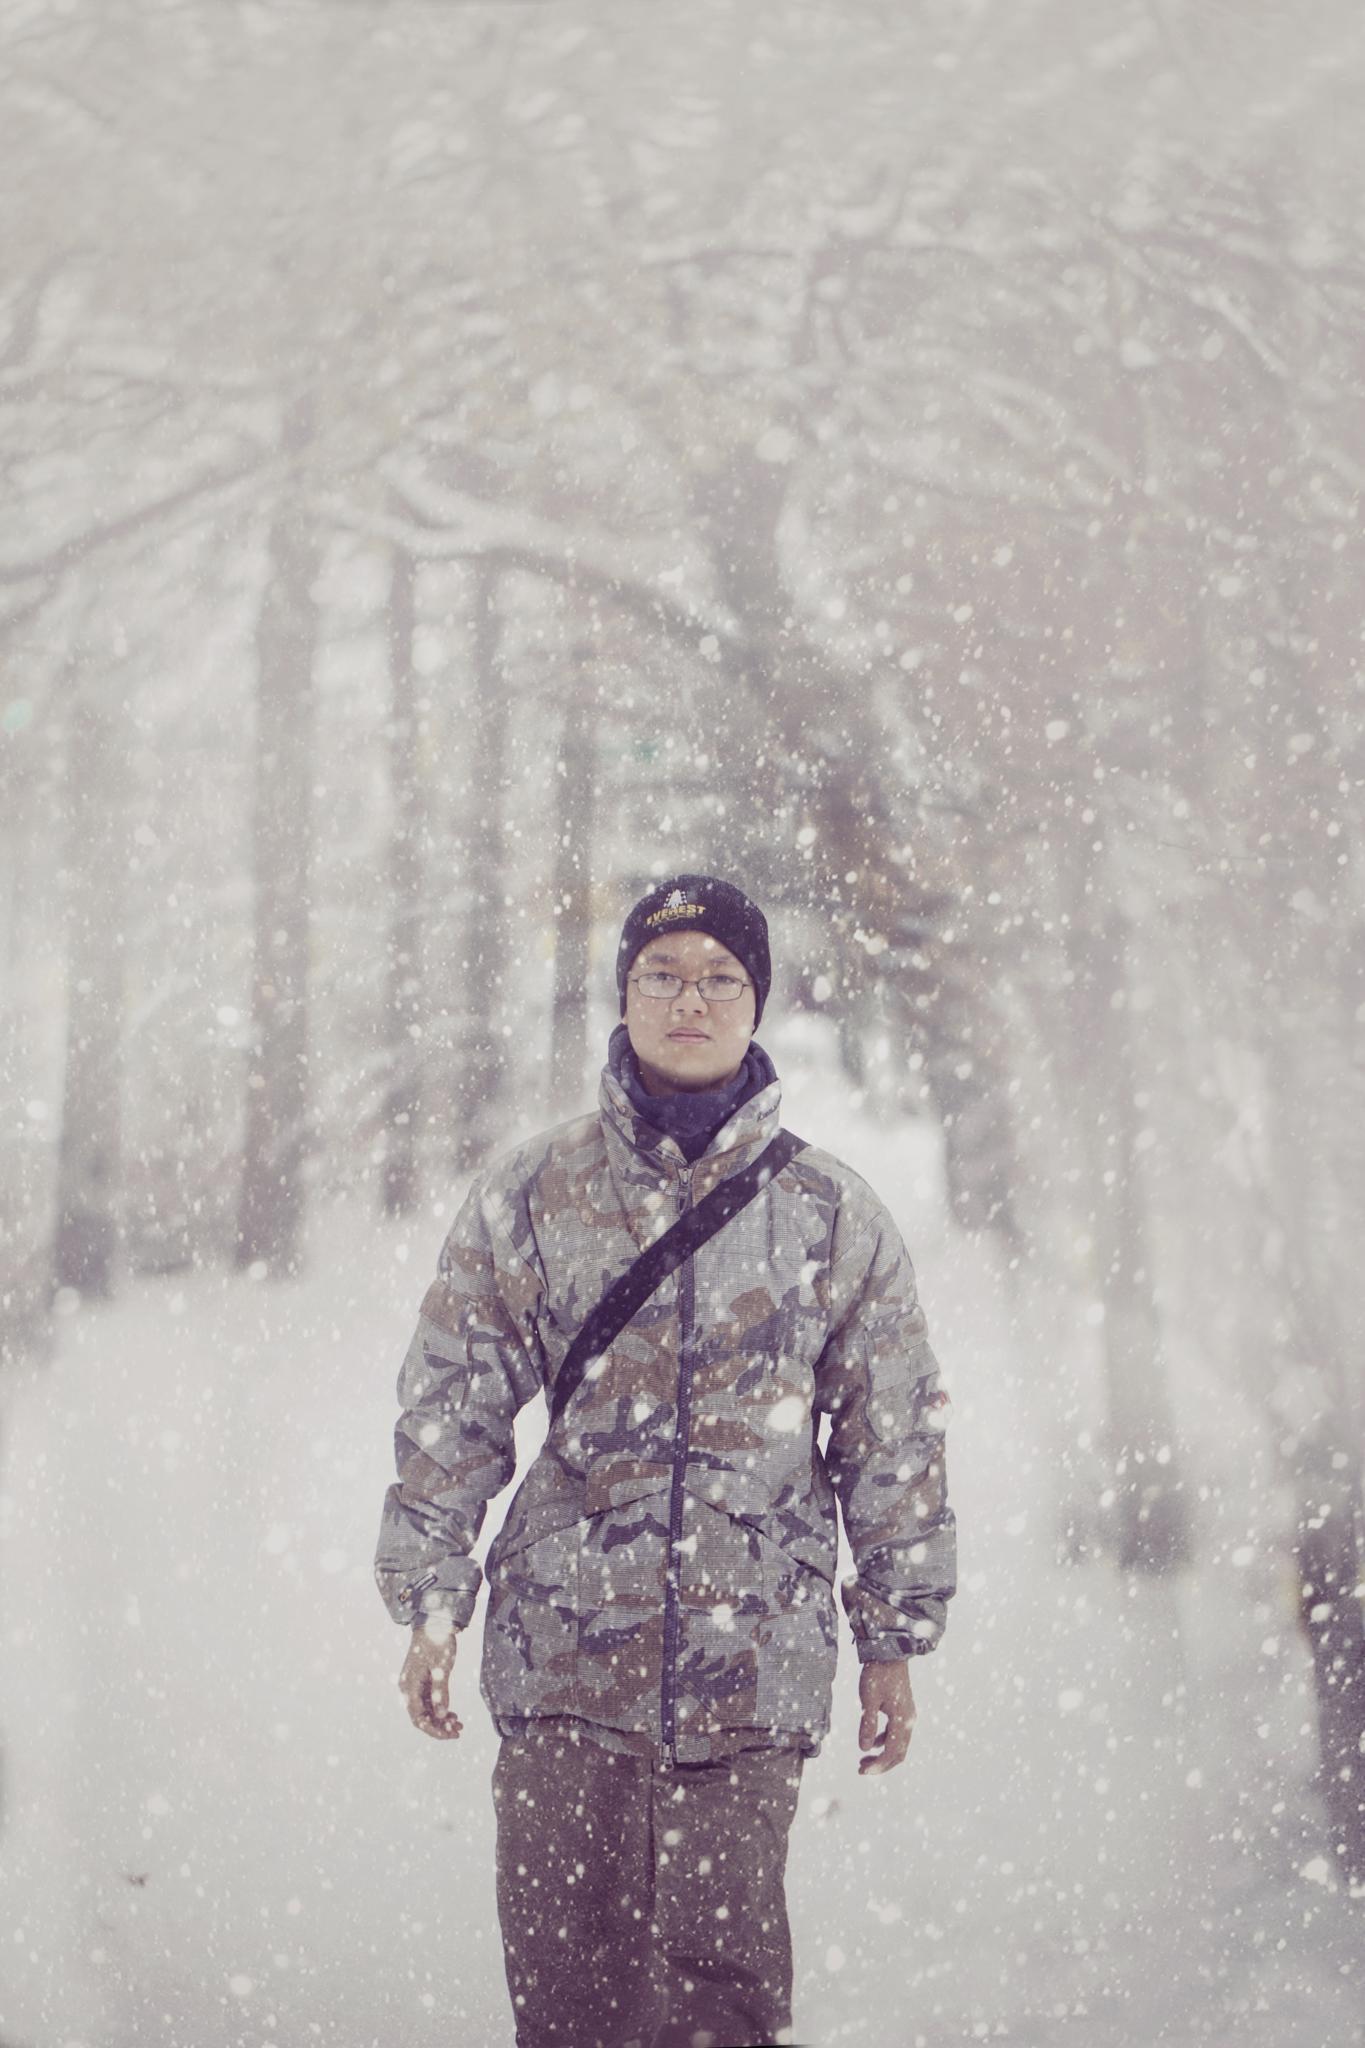 Snow Storm 2015 by djoni.djaafar